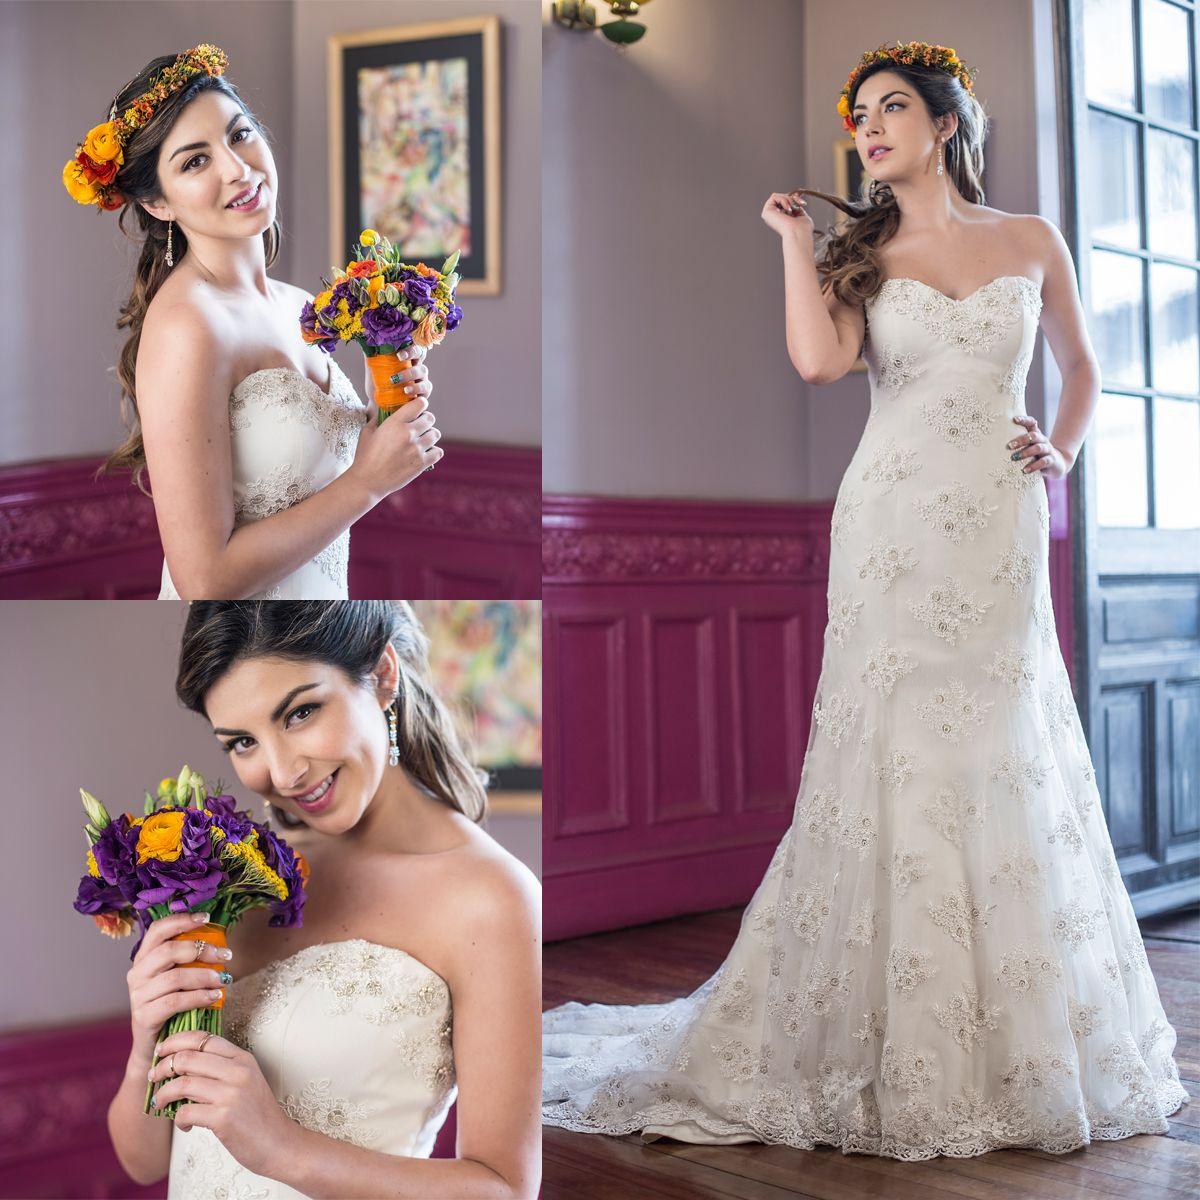 Vestido de novia strapless escote corazón · Strapless Sweetheart Trumpet Wedding Dress